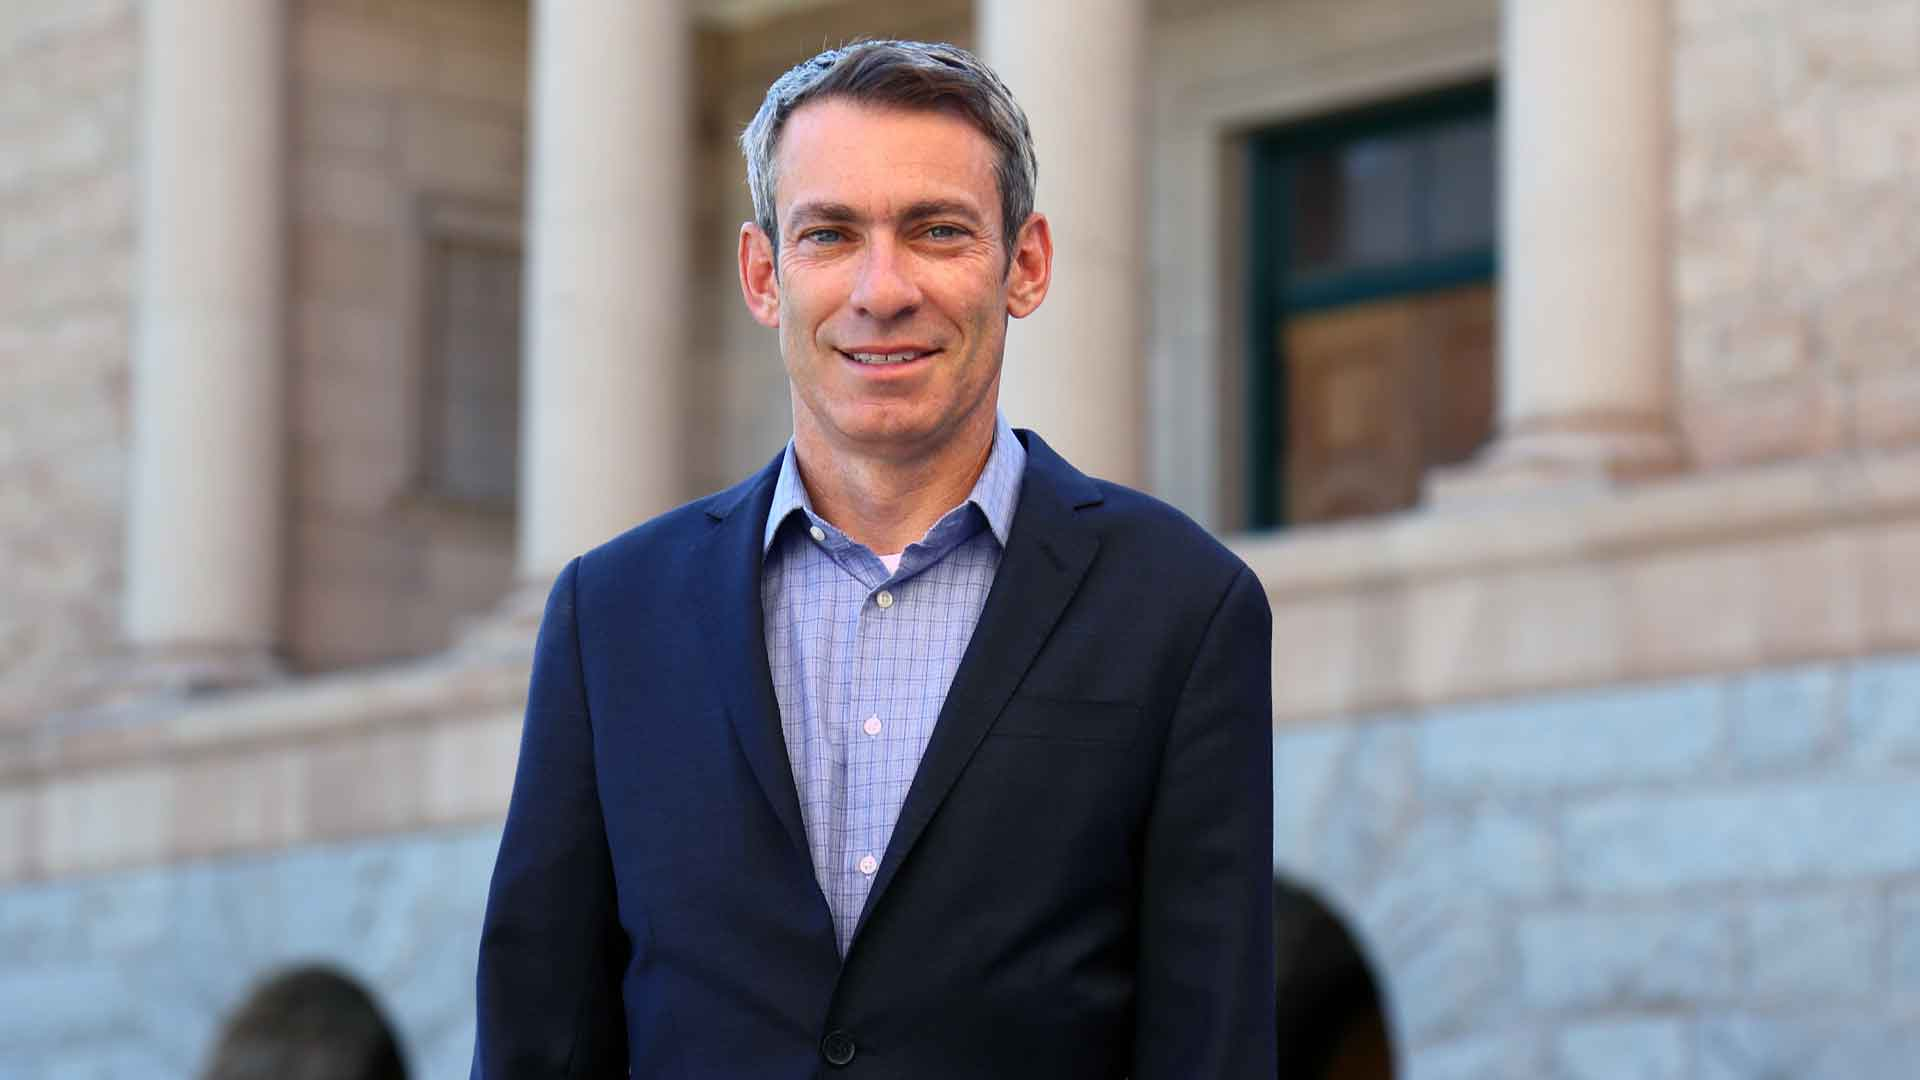 State Rep. Aaron Lieberman entered the Democratic gubernatorial primary in June 2021.